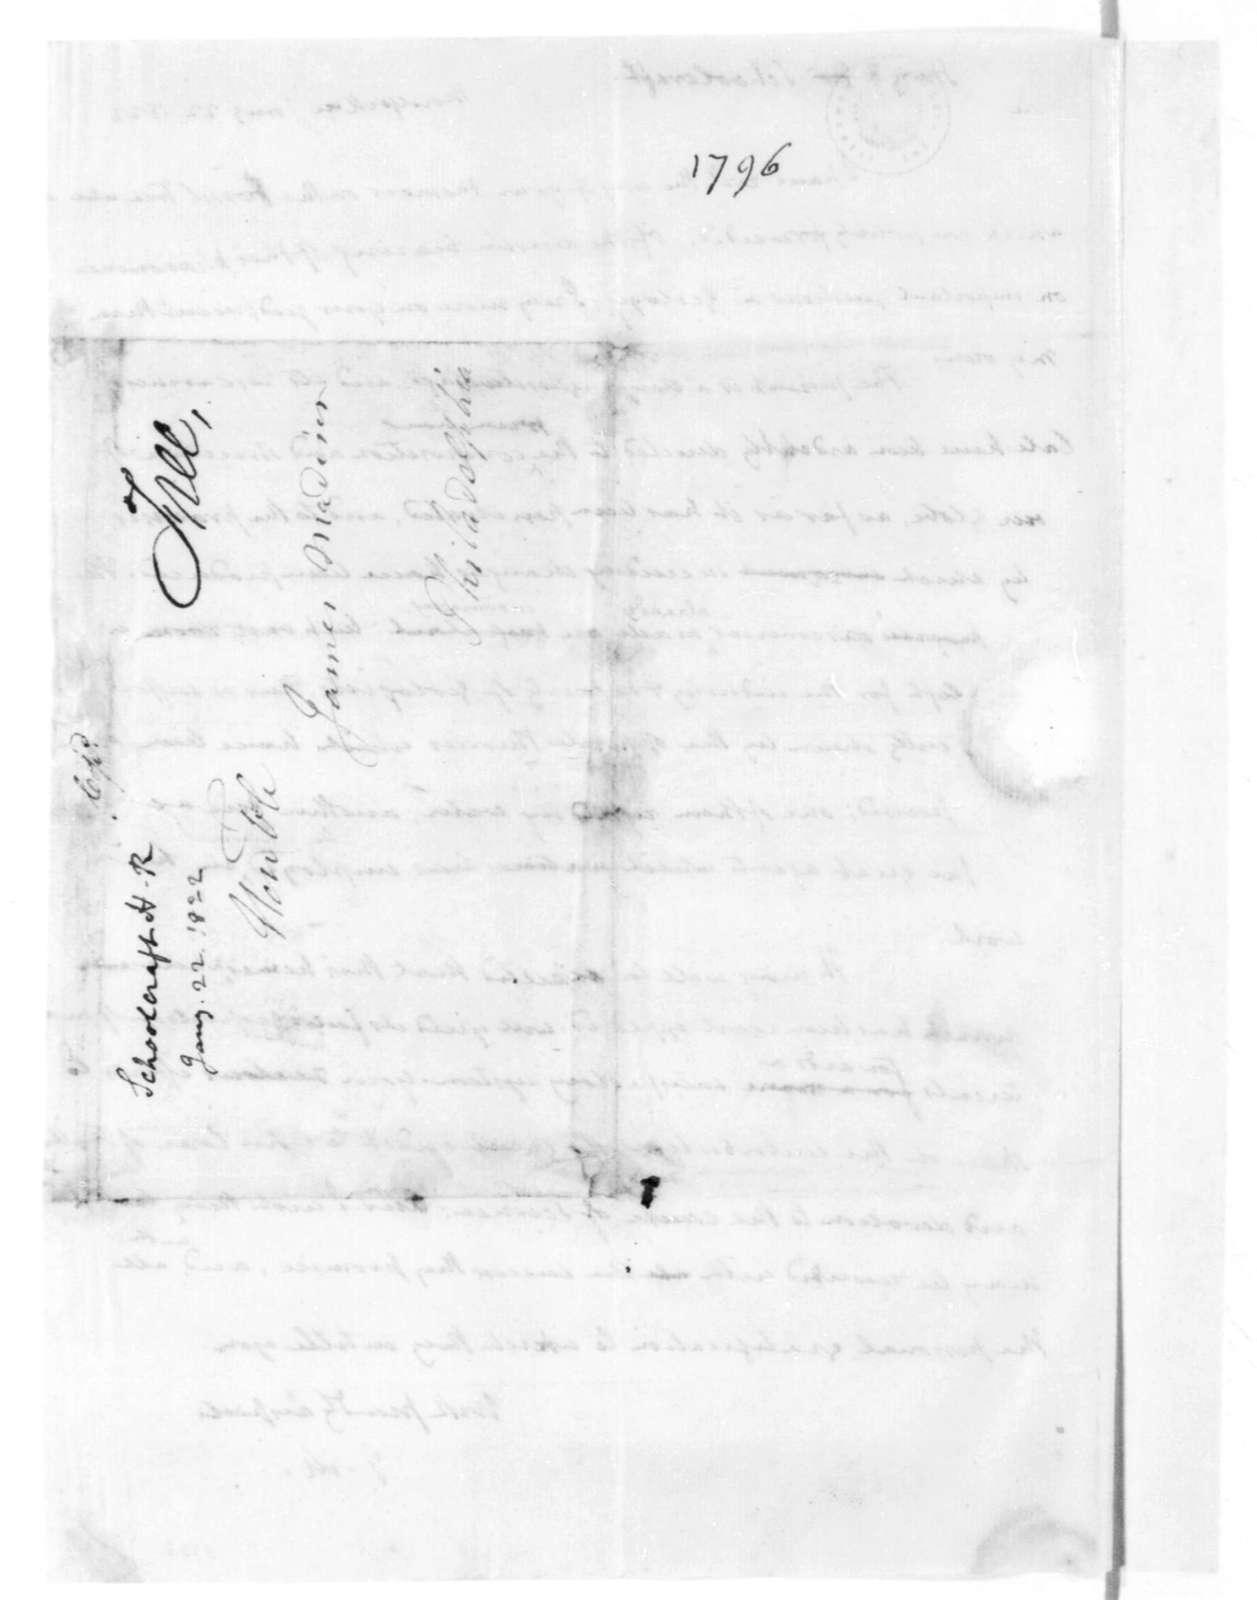 James Madison to Henry R. Schoolcraft, January 22, 1822.